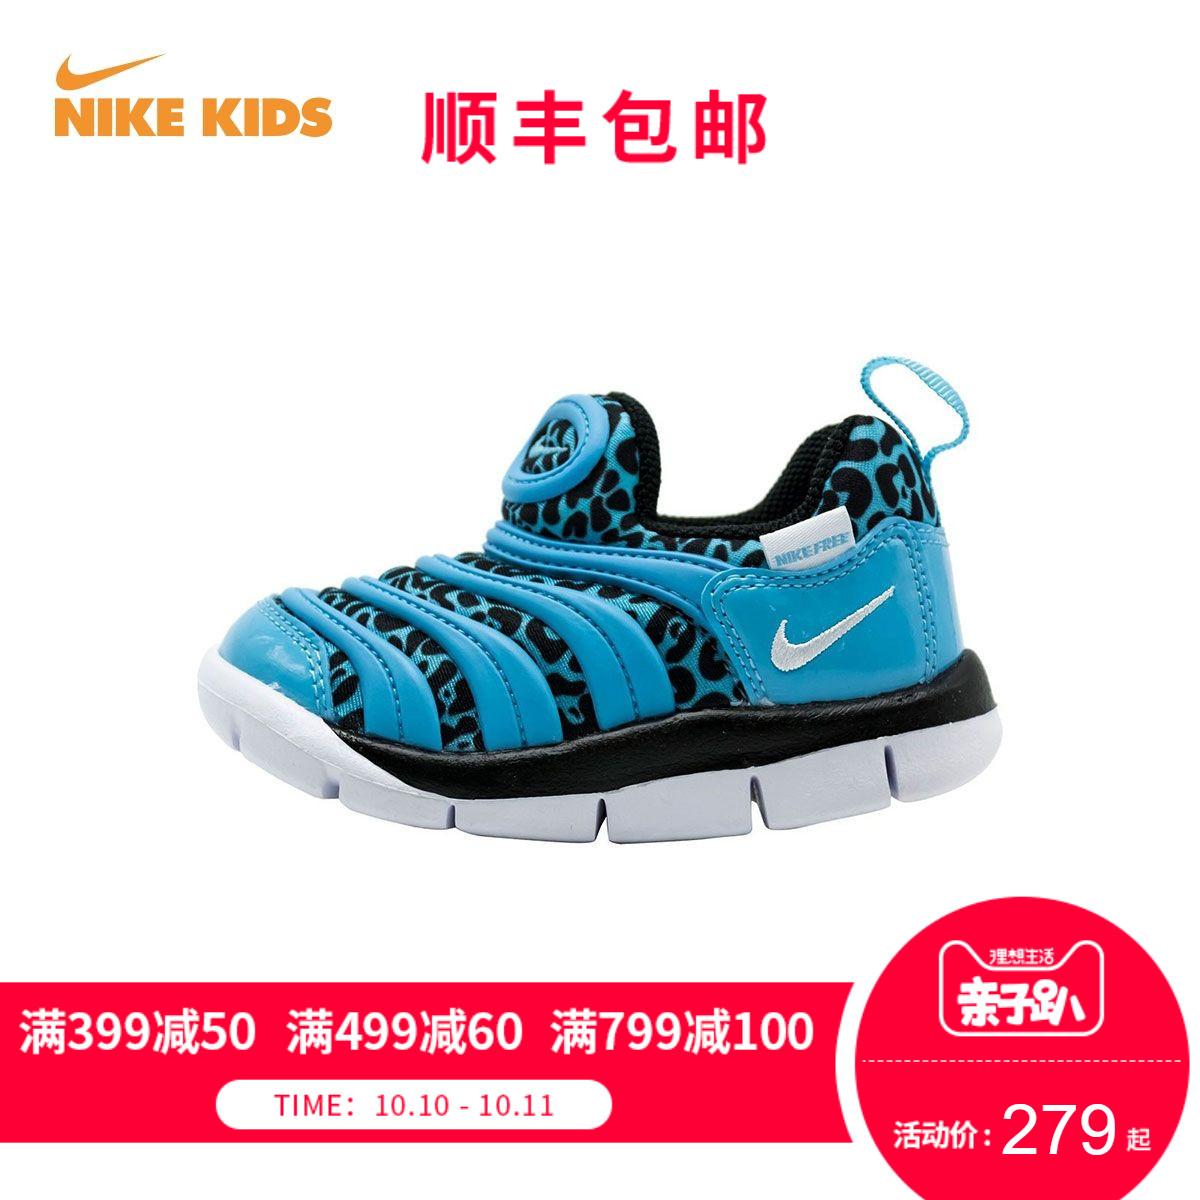 NIKE耐克毛毛虫儿童缓震运动鞋婴童小童跑步鞋男女童2018秋季新款